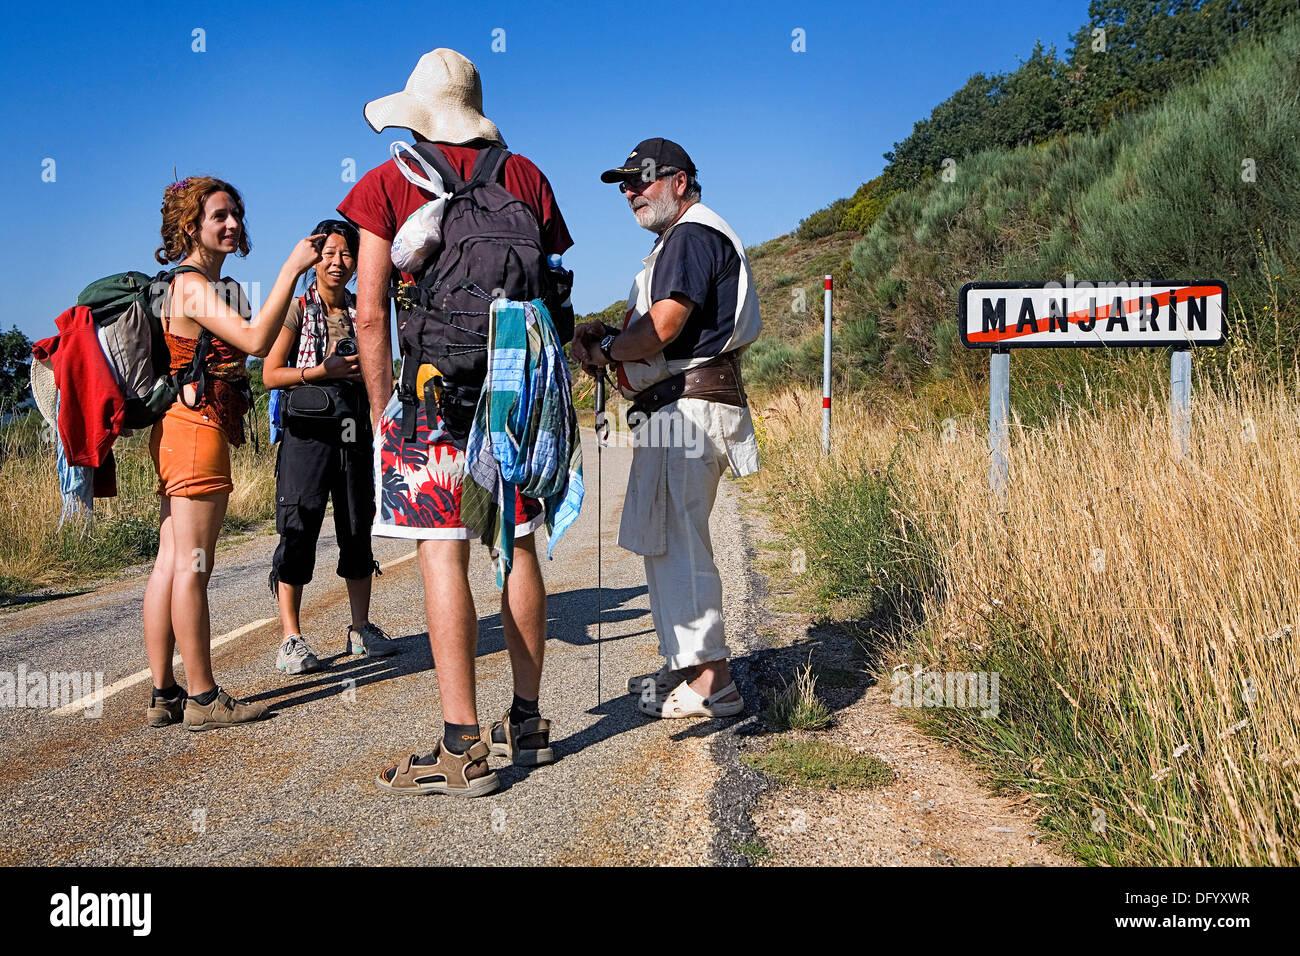 Tomás Martín saying goodbye to pilgrims. Tomás is the `hospitalero´ of pilgrim´s hostel in Manjarín. - Stock Image